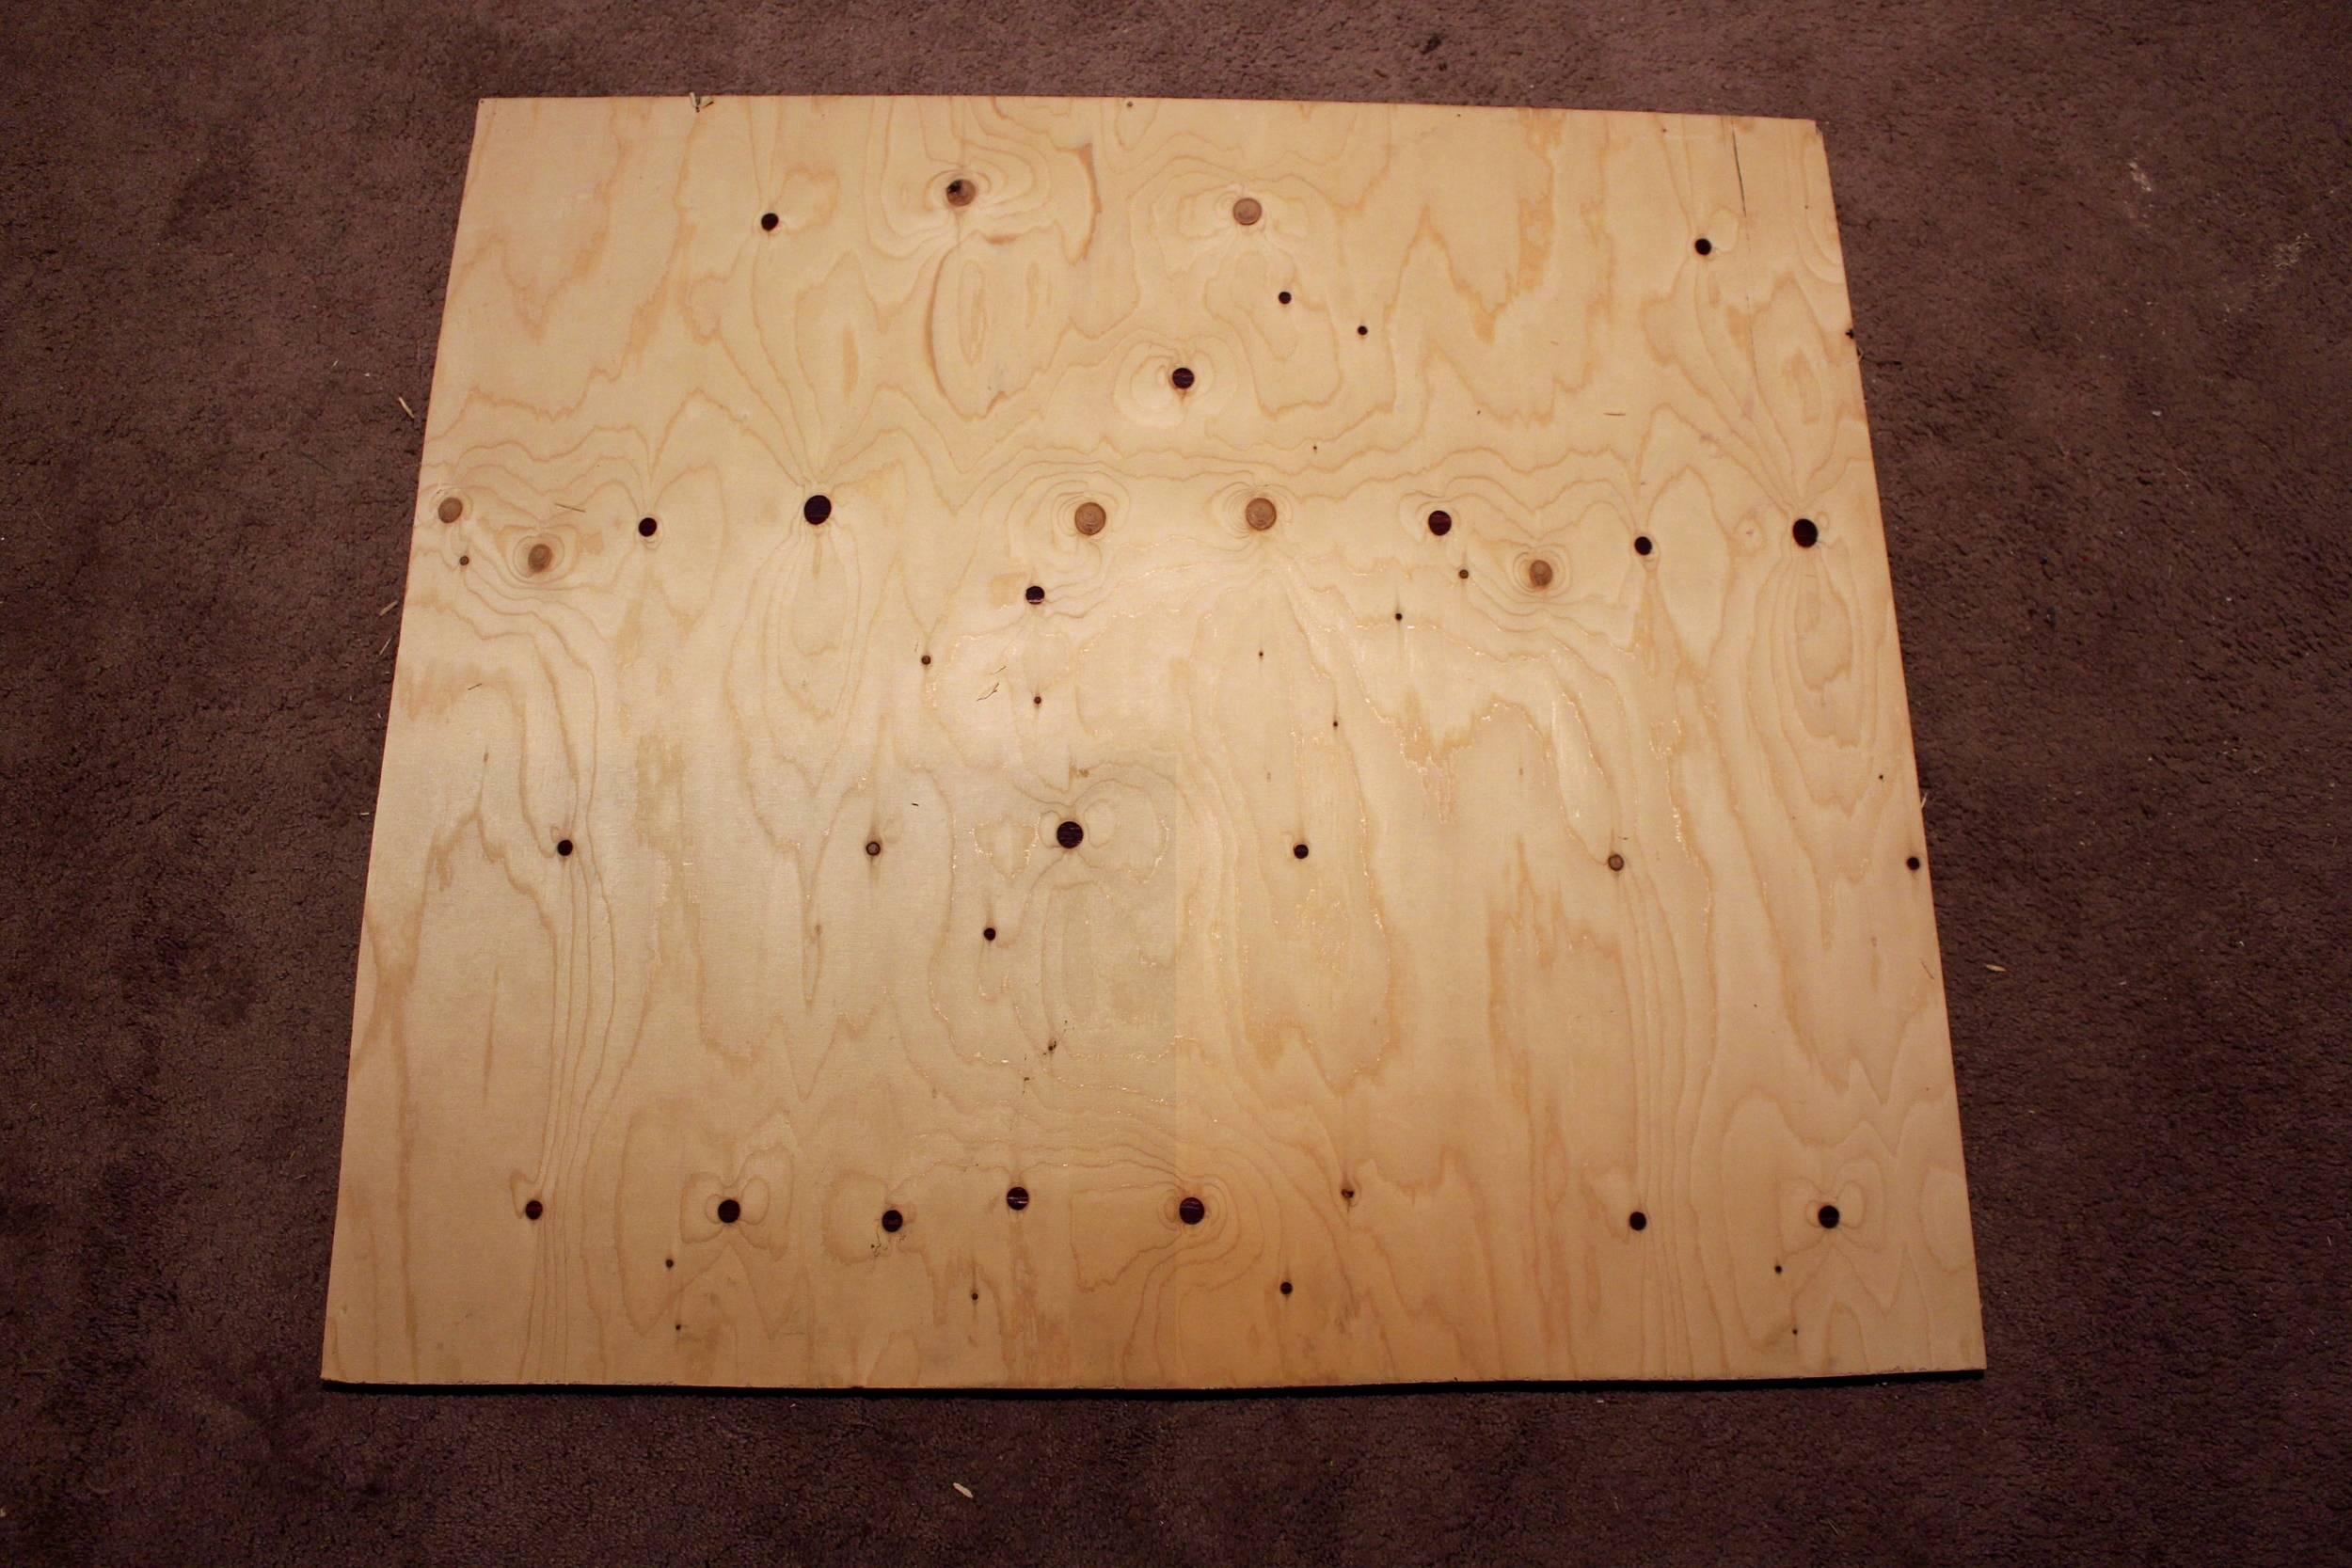 8f579 plywood plywood